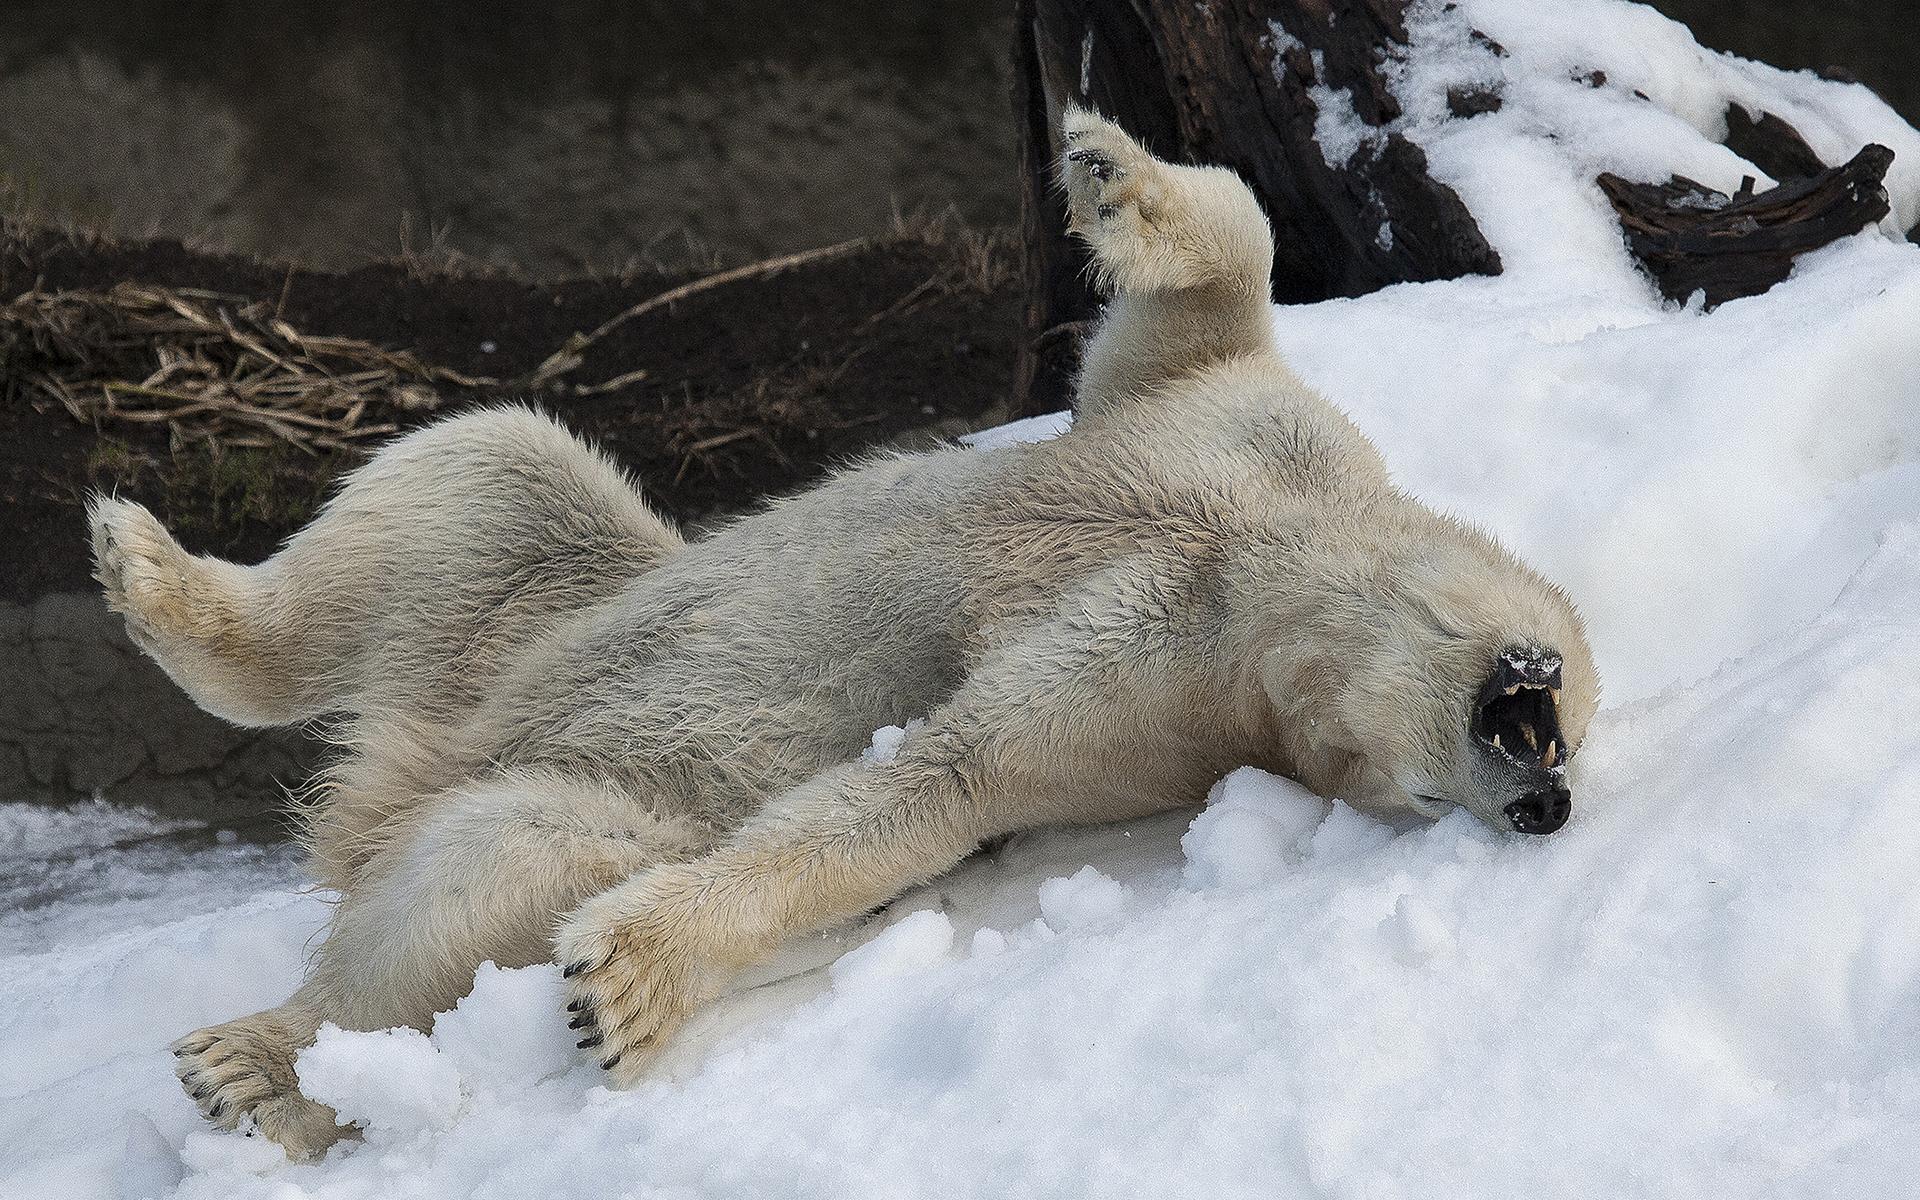 animals polar bear winter snow mood happy fun play. Black Bedroom Furniture Sets. Home Design Ideas